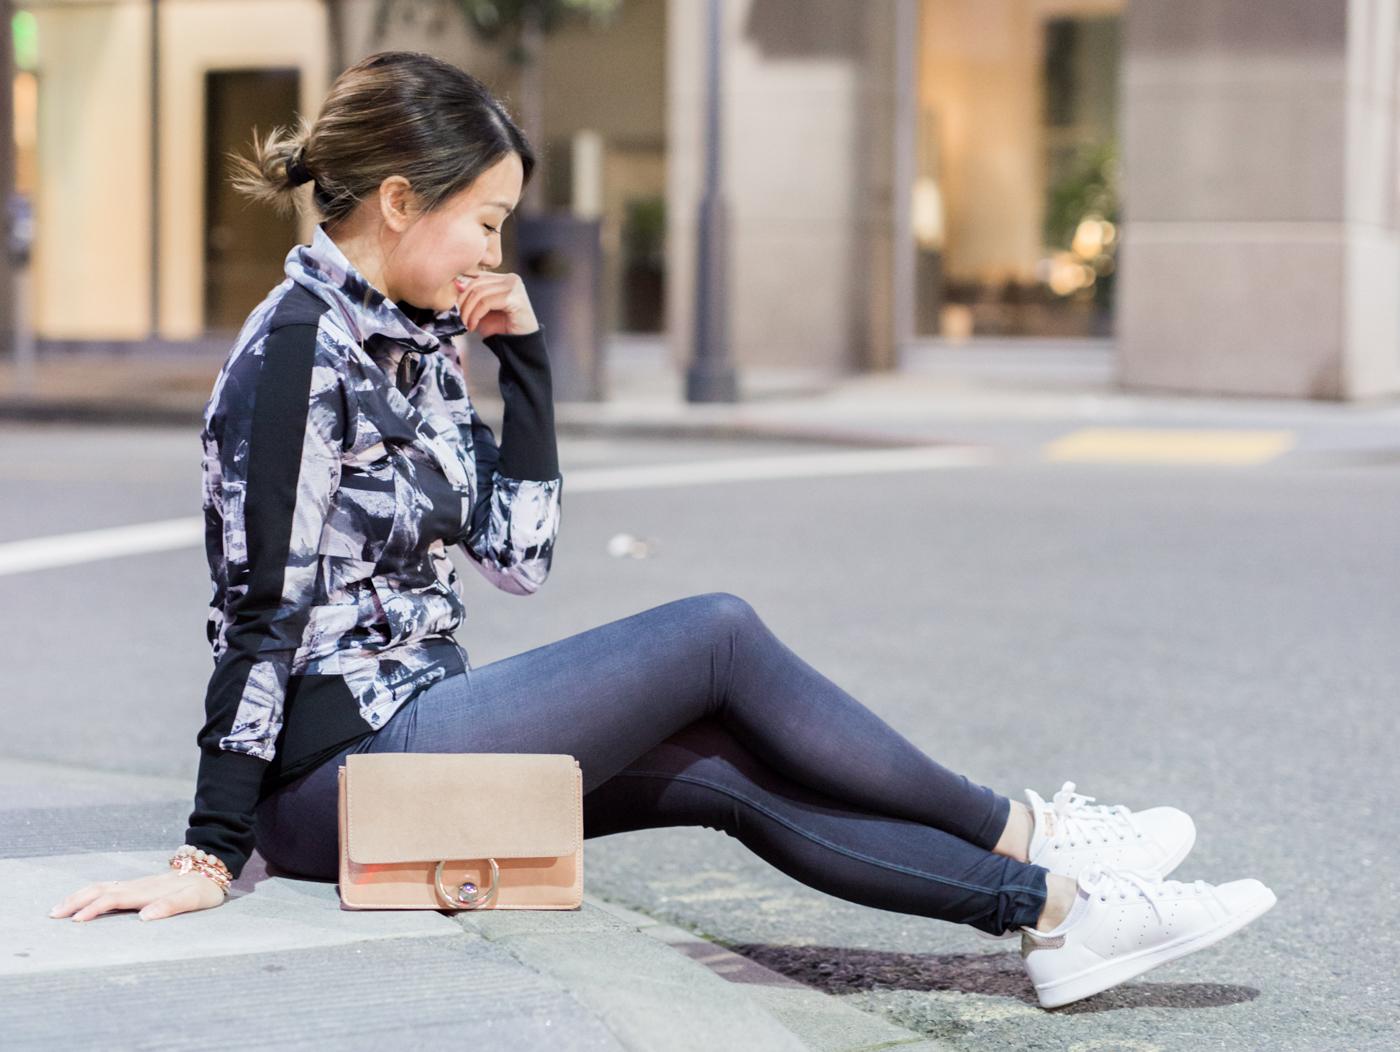 lucy indiGO Run Tights & Adidas Stan Smith Copper Metallic Sneakers | The Chic Diary